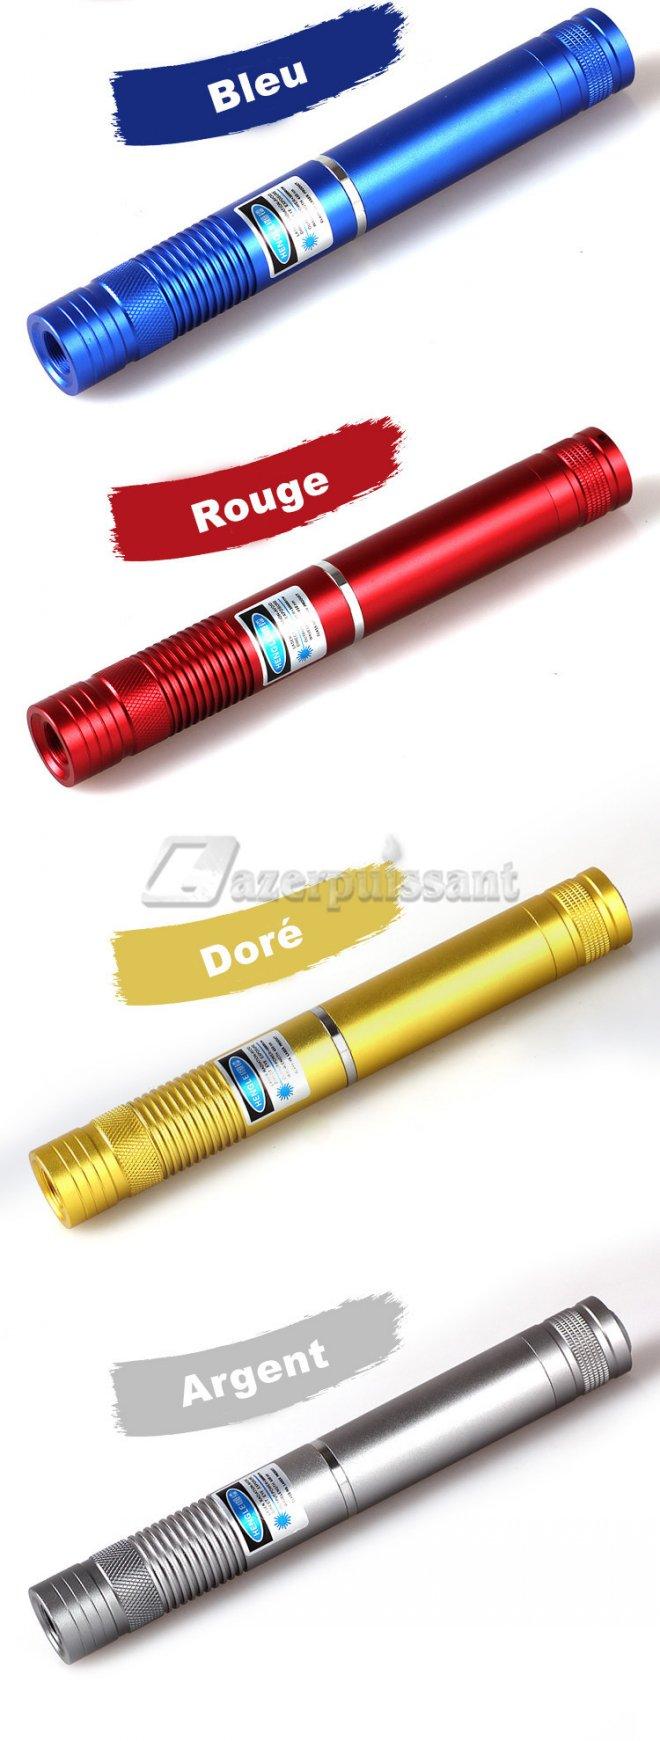 Achat Pointeur Laser 5000mw Bleu